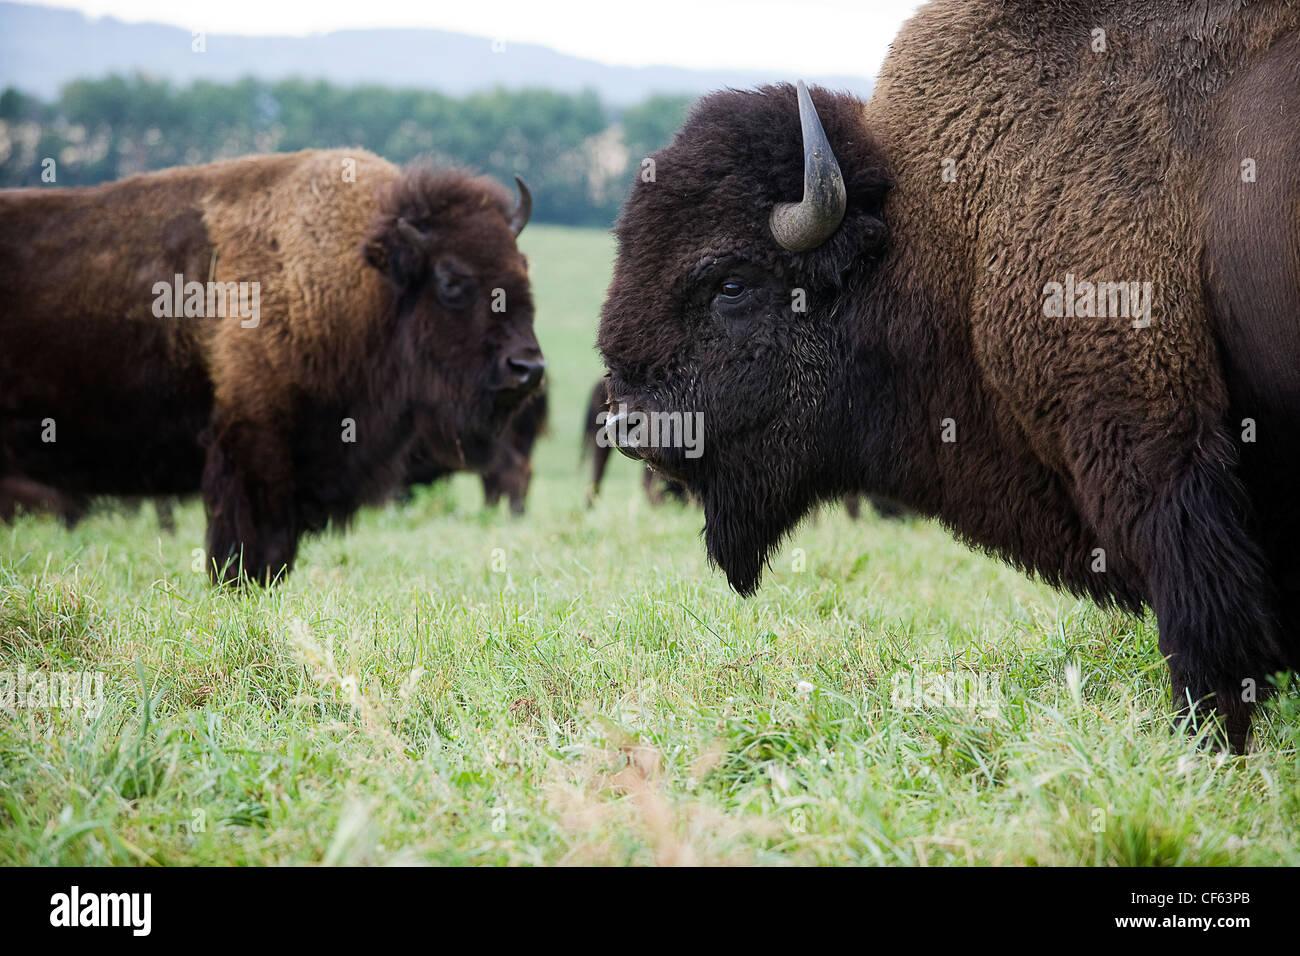 Plains bison, Alberta, Canada. - Stock Image